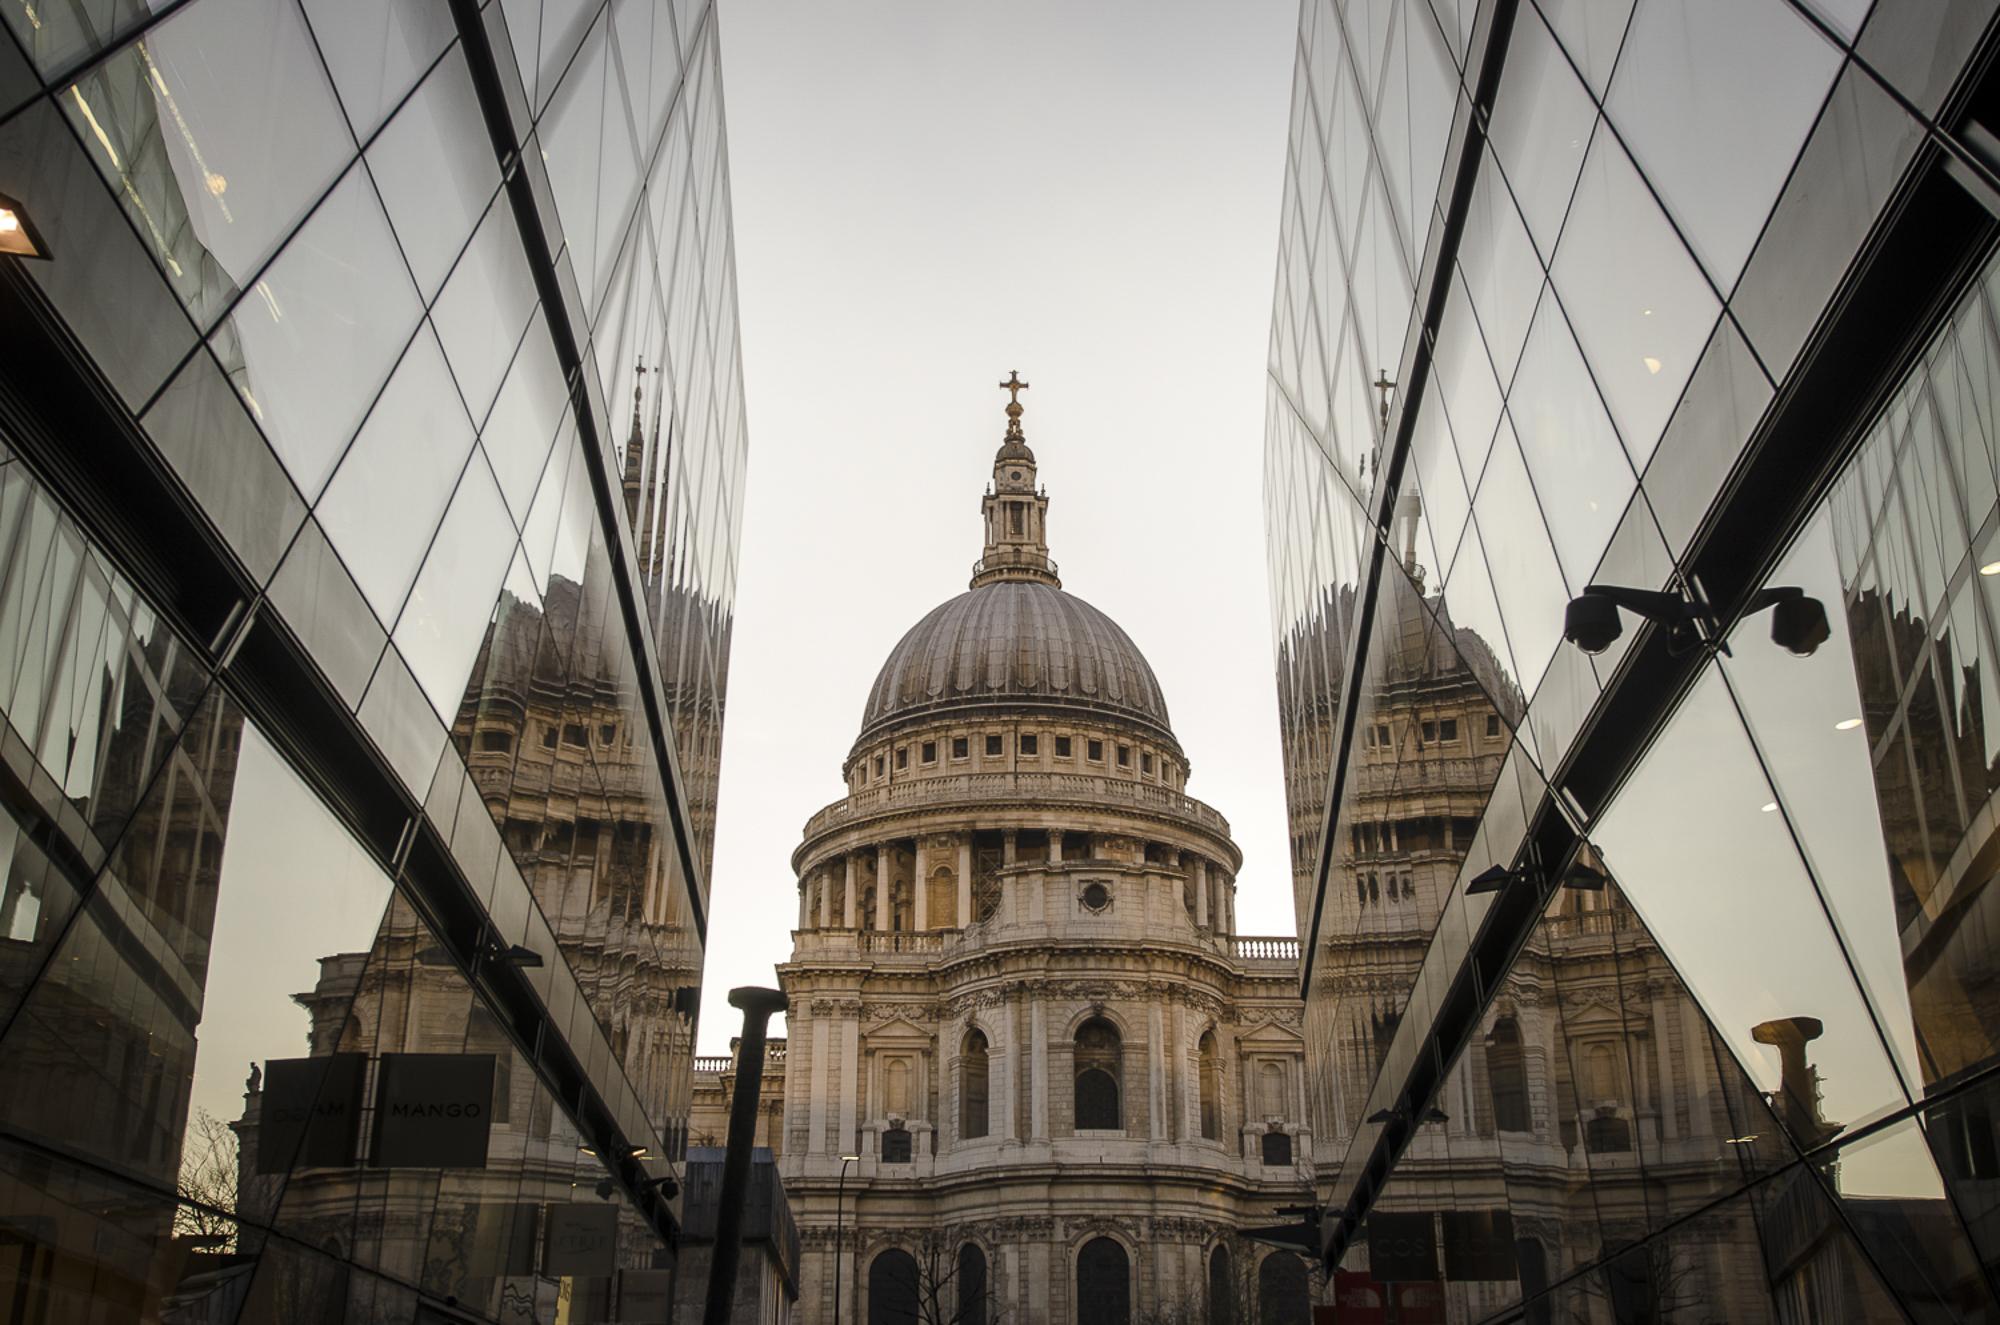 St. Paul's - London  PHOTOGRAPHY: ALEXANDER J.E. BRADLEY • NIKON D7000 • AF-S NIKKOR 14-24 ƒ/2.8G ED @ 24MM • ƒ/7.1 • 1/125 • ISO 100